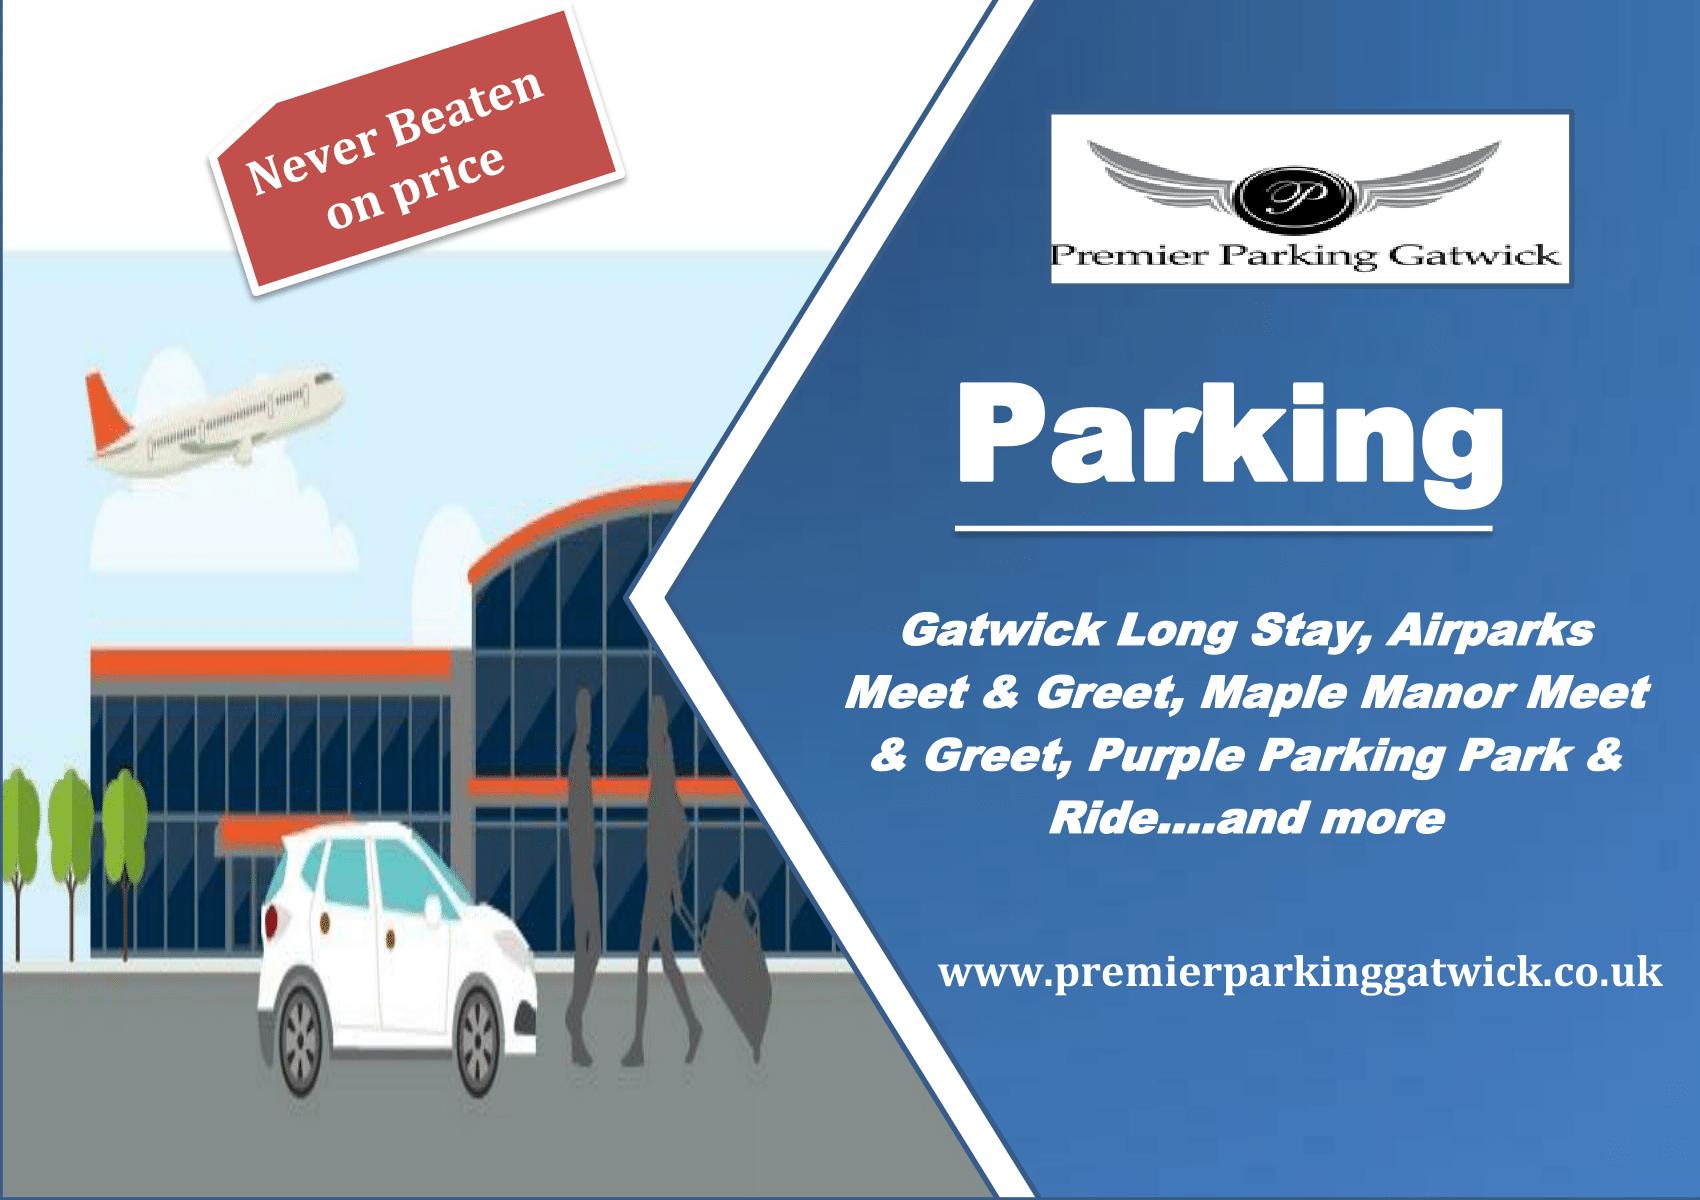 Premier parking gatwick premierparkingg on pinterest m4hsunfo